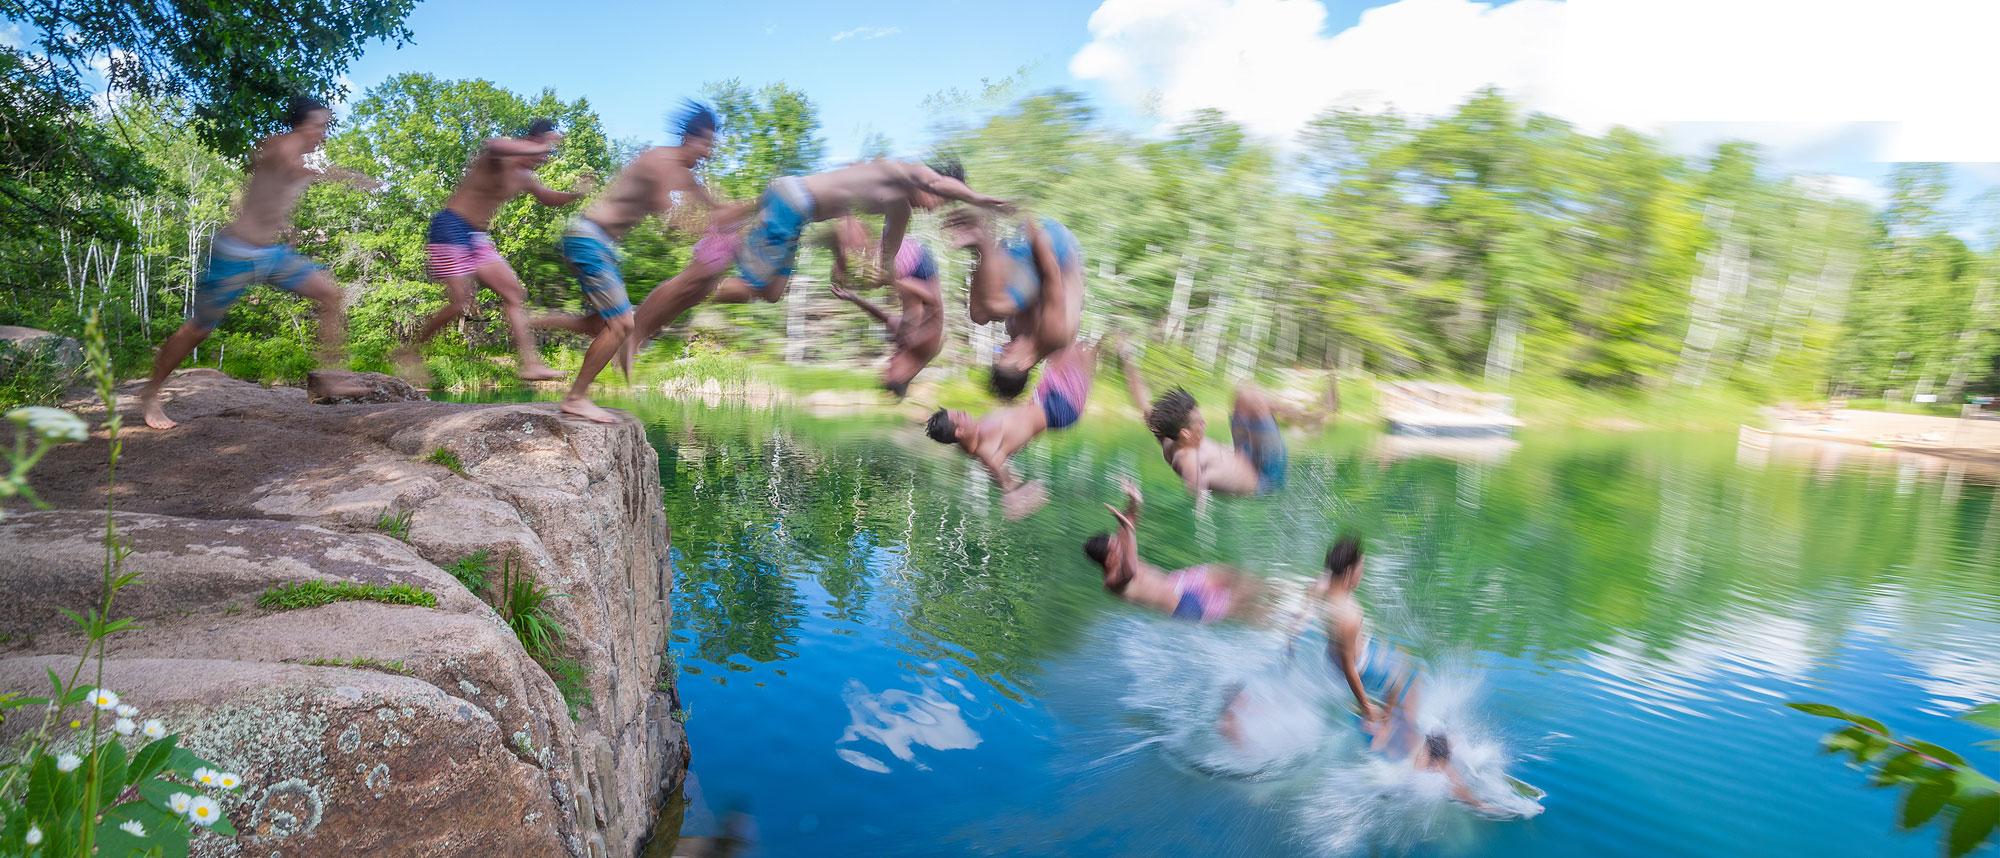 IMAGE: Jumping Into Quary Lake